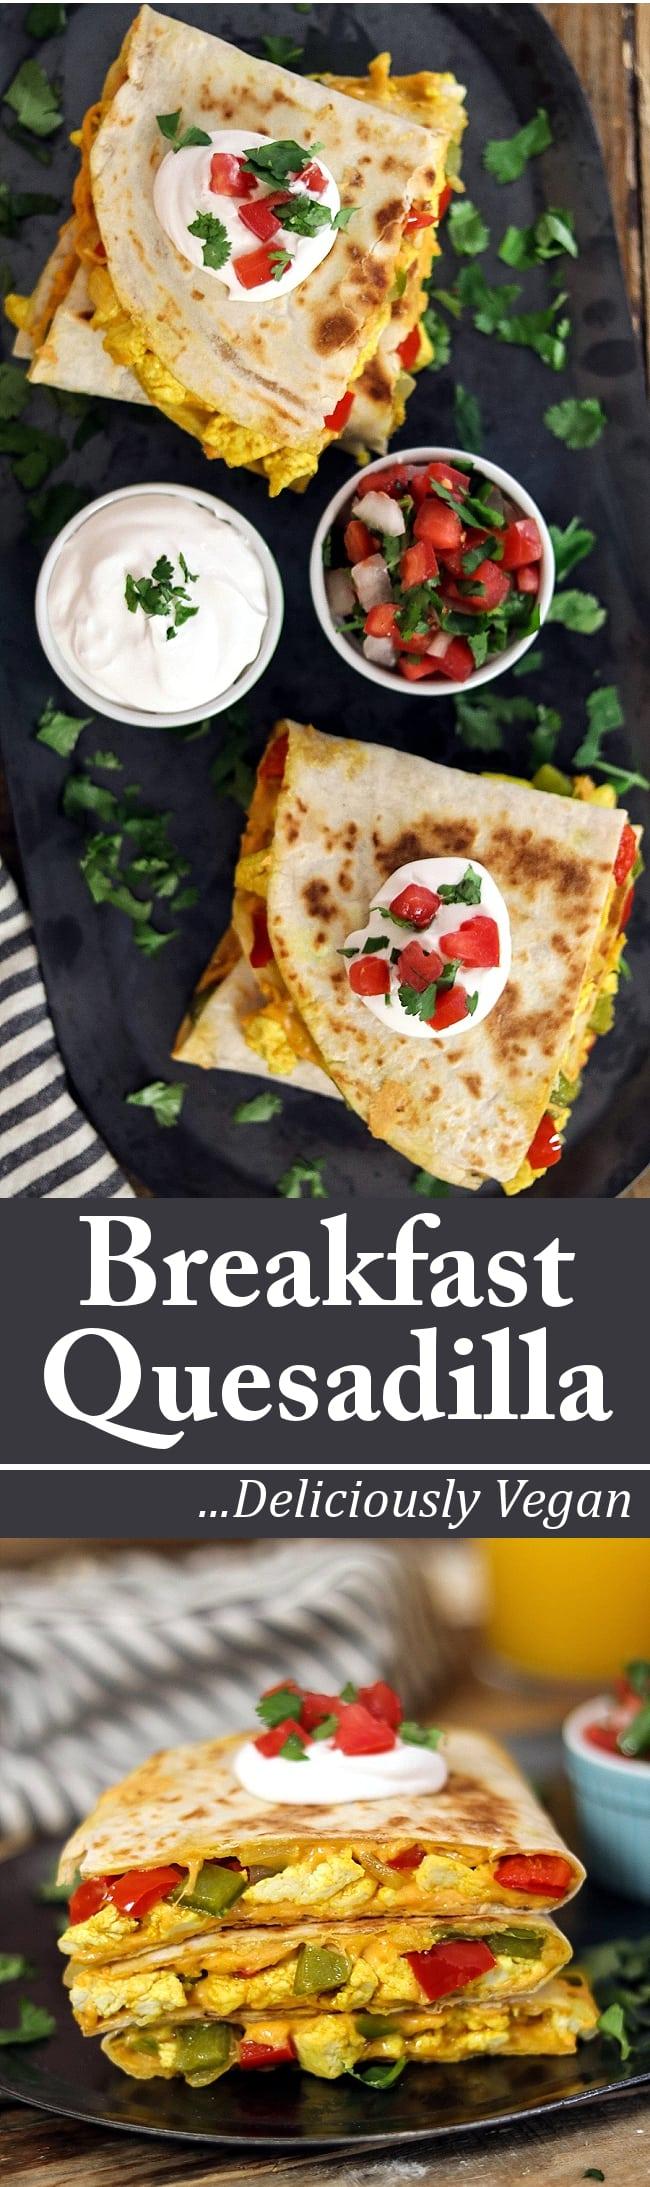 Satisfy your morning hunger with this loaded Vegan Breakfast Quesadilla. #veganbreakfast